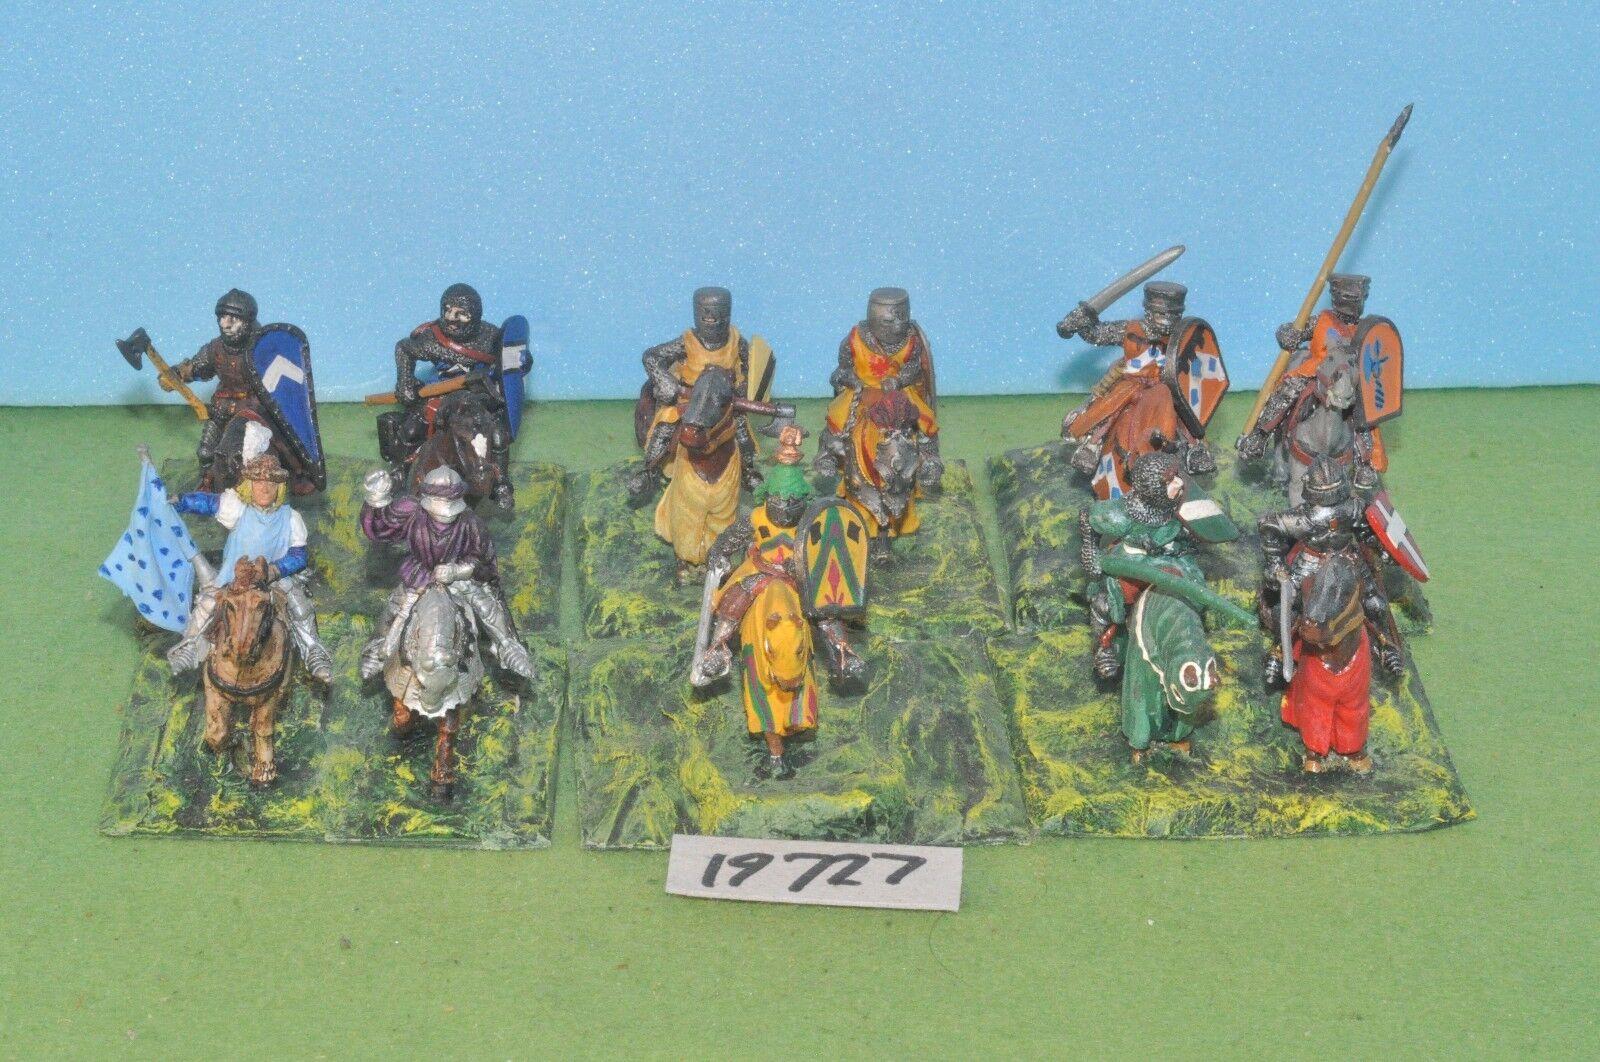 Warhammer fantasy free peoples empire brettonnian knights 11 metal - (19727)